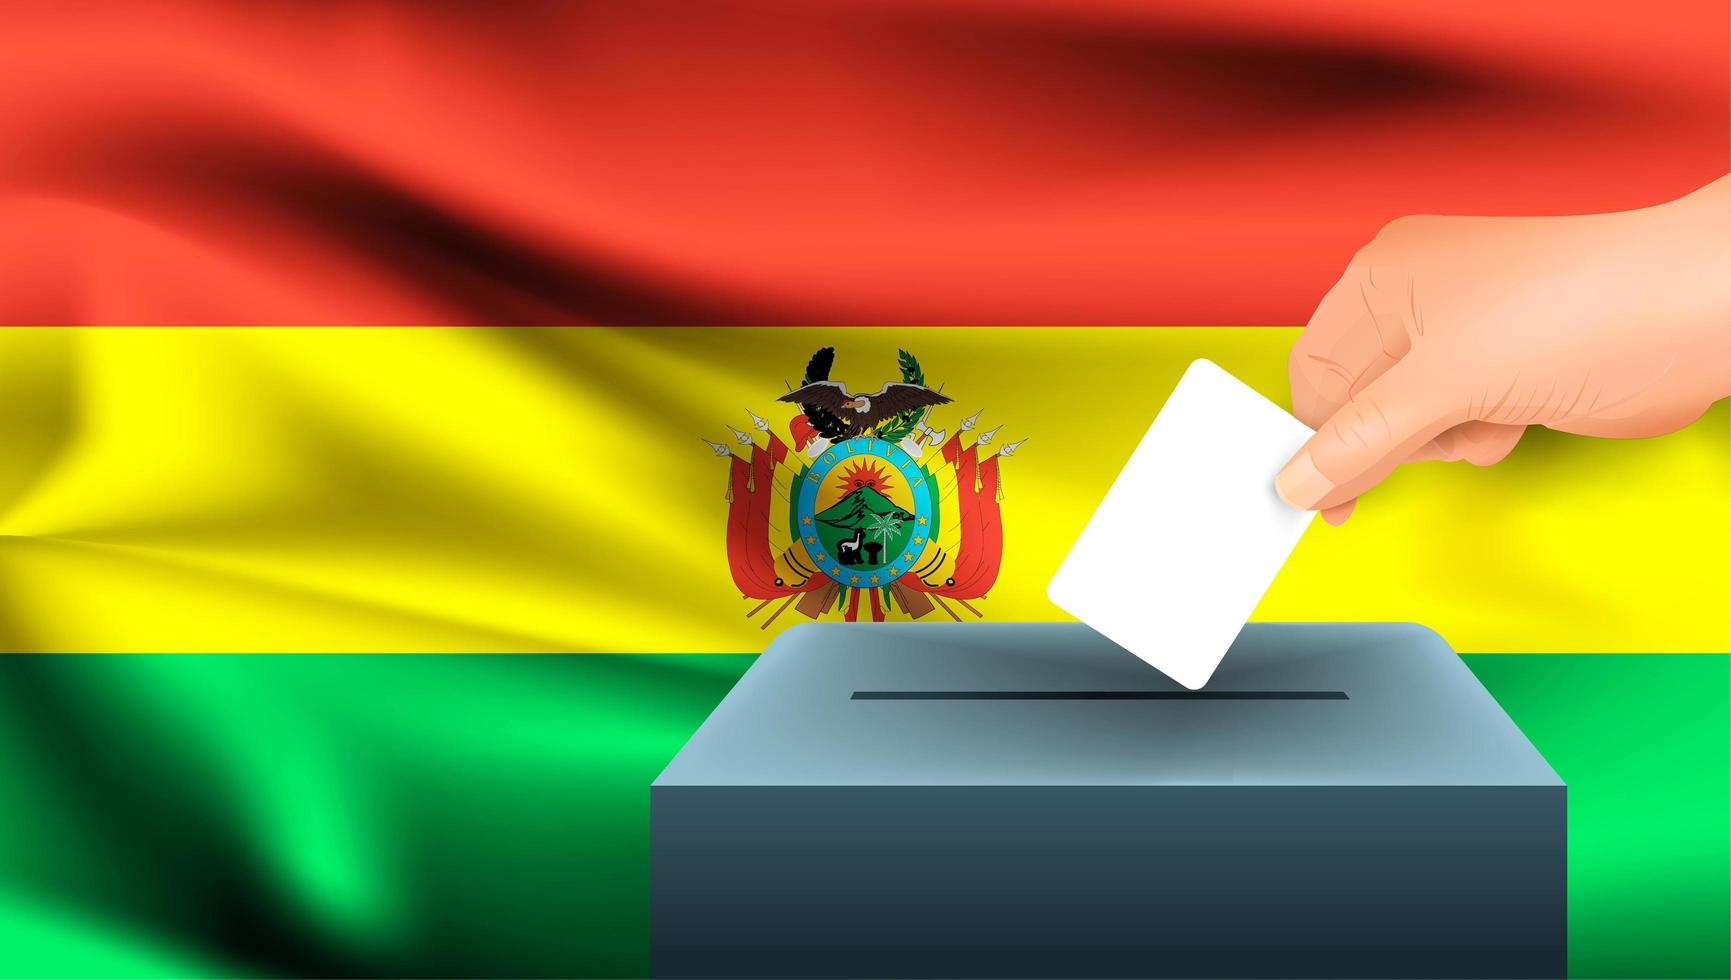 Hand putting ballot into ballot box with Bolivian flag  vector